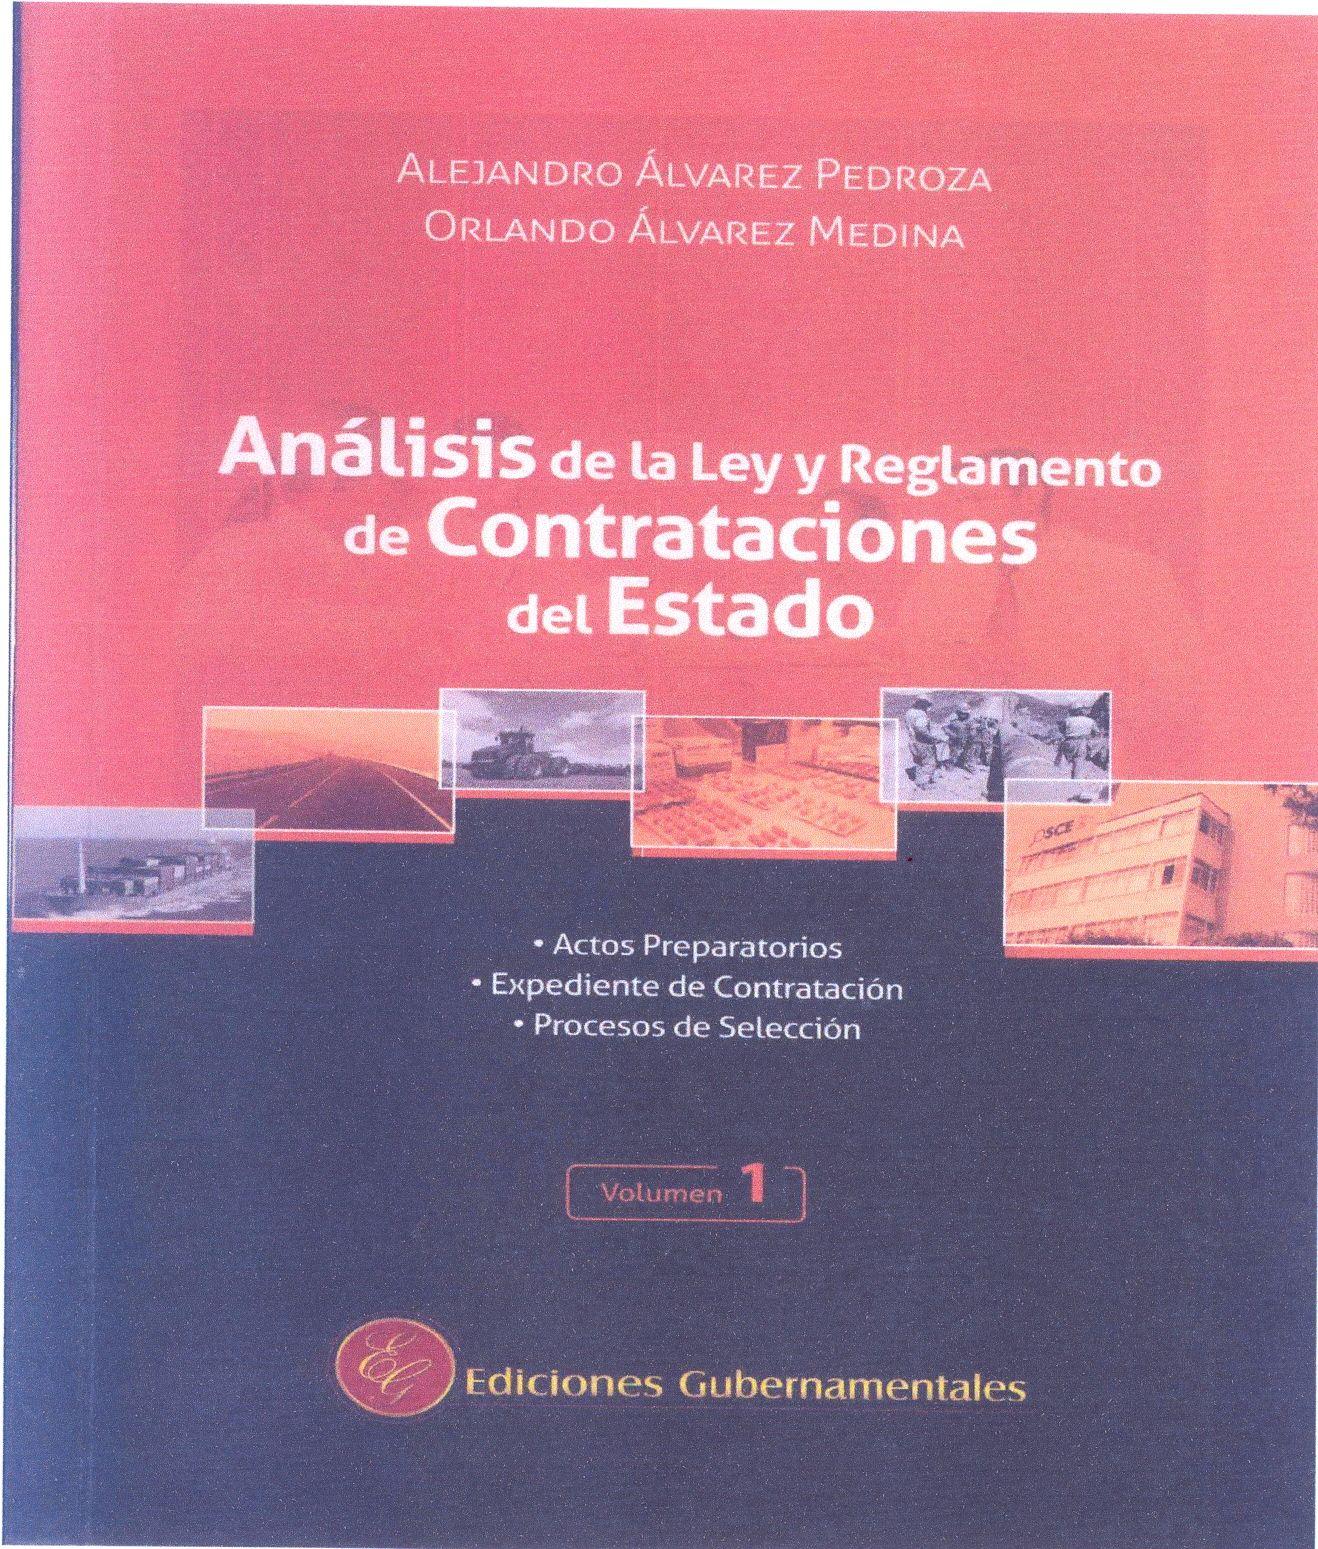 343.60185L A45A T.1  [3 tomos] /      Piso 2 Derecho - DR550